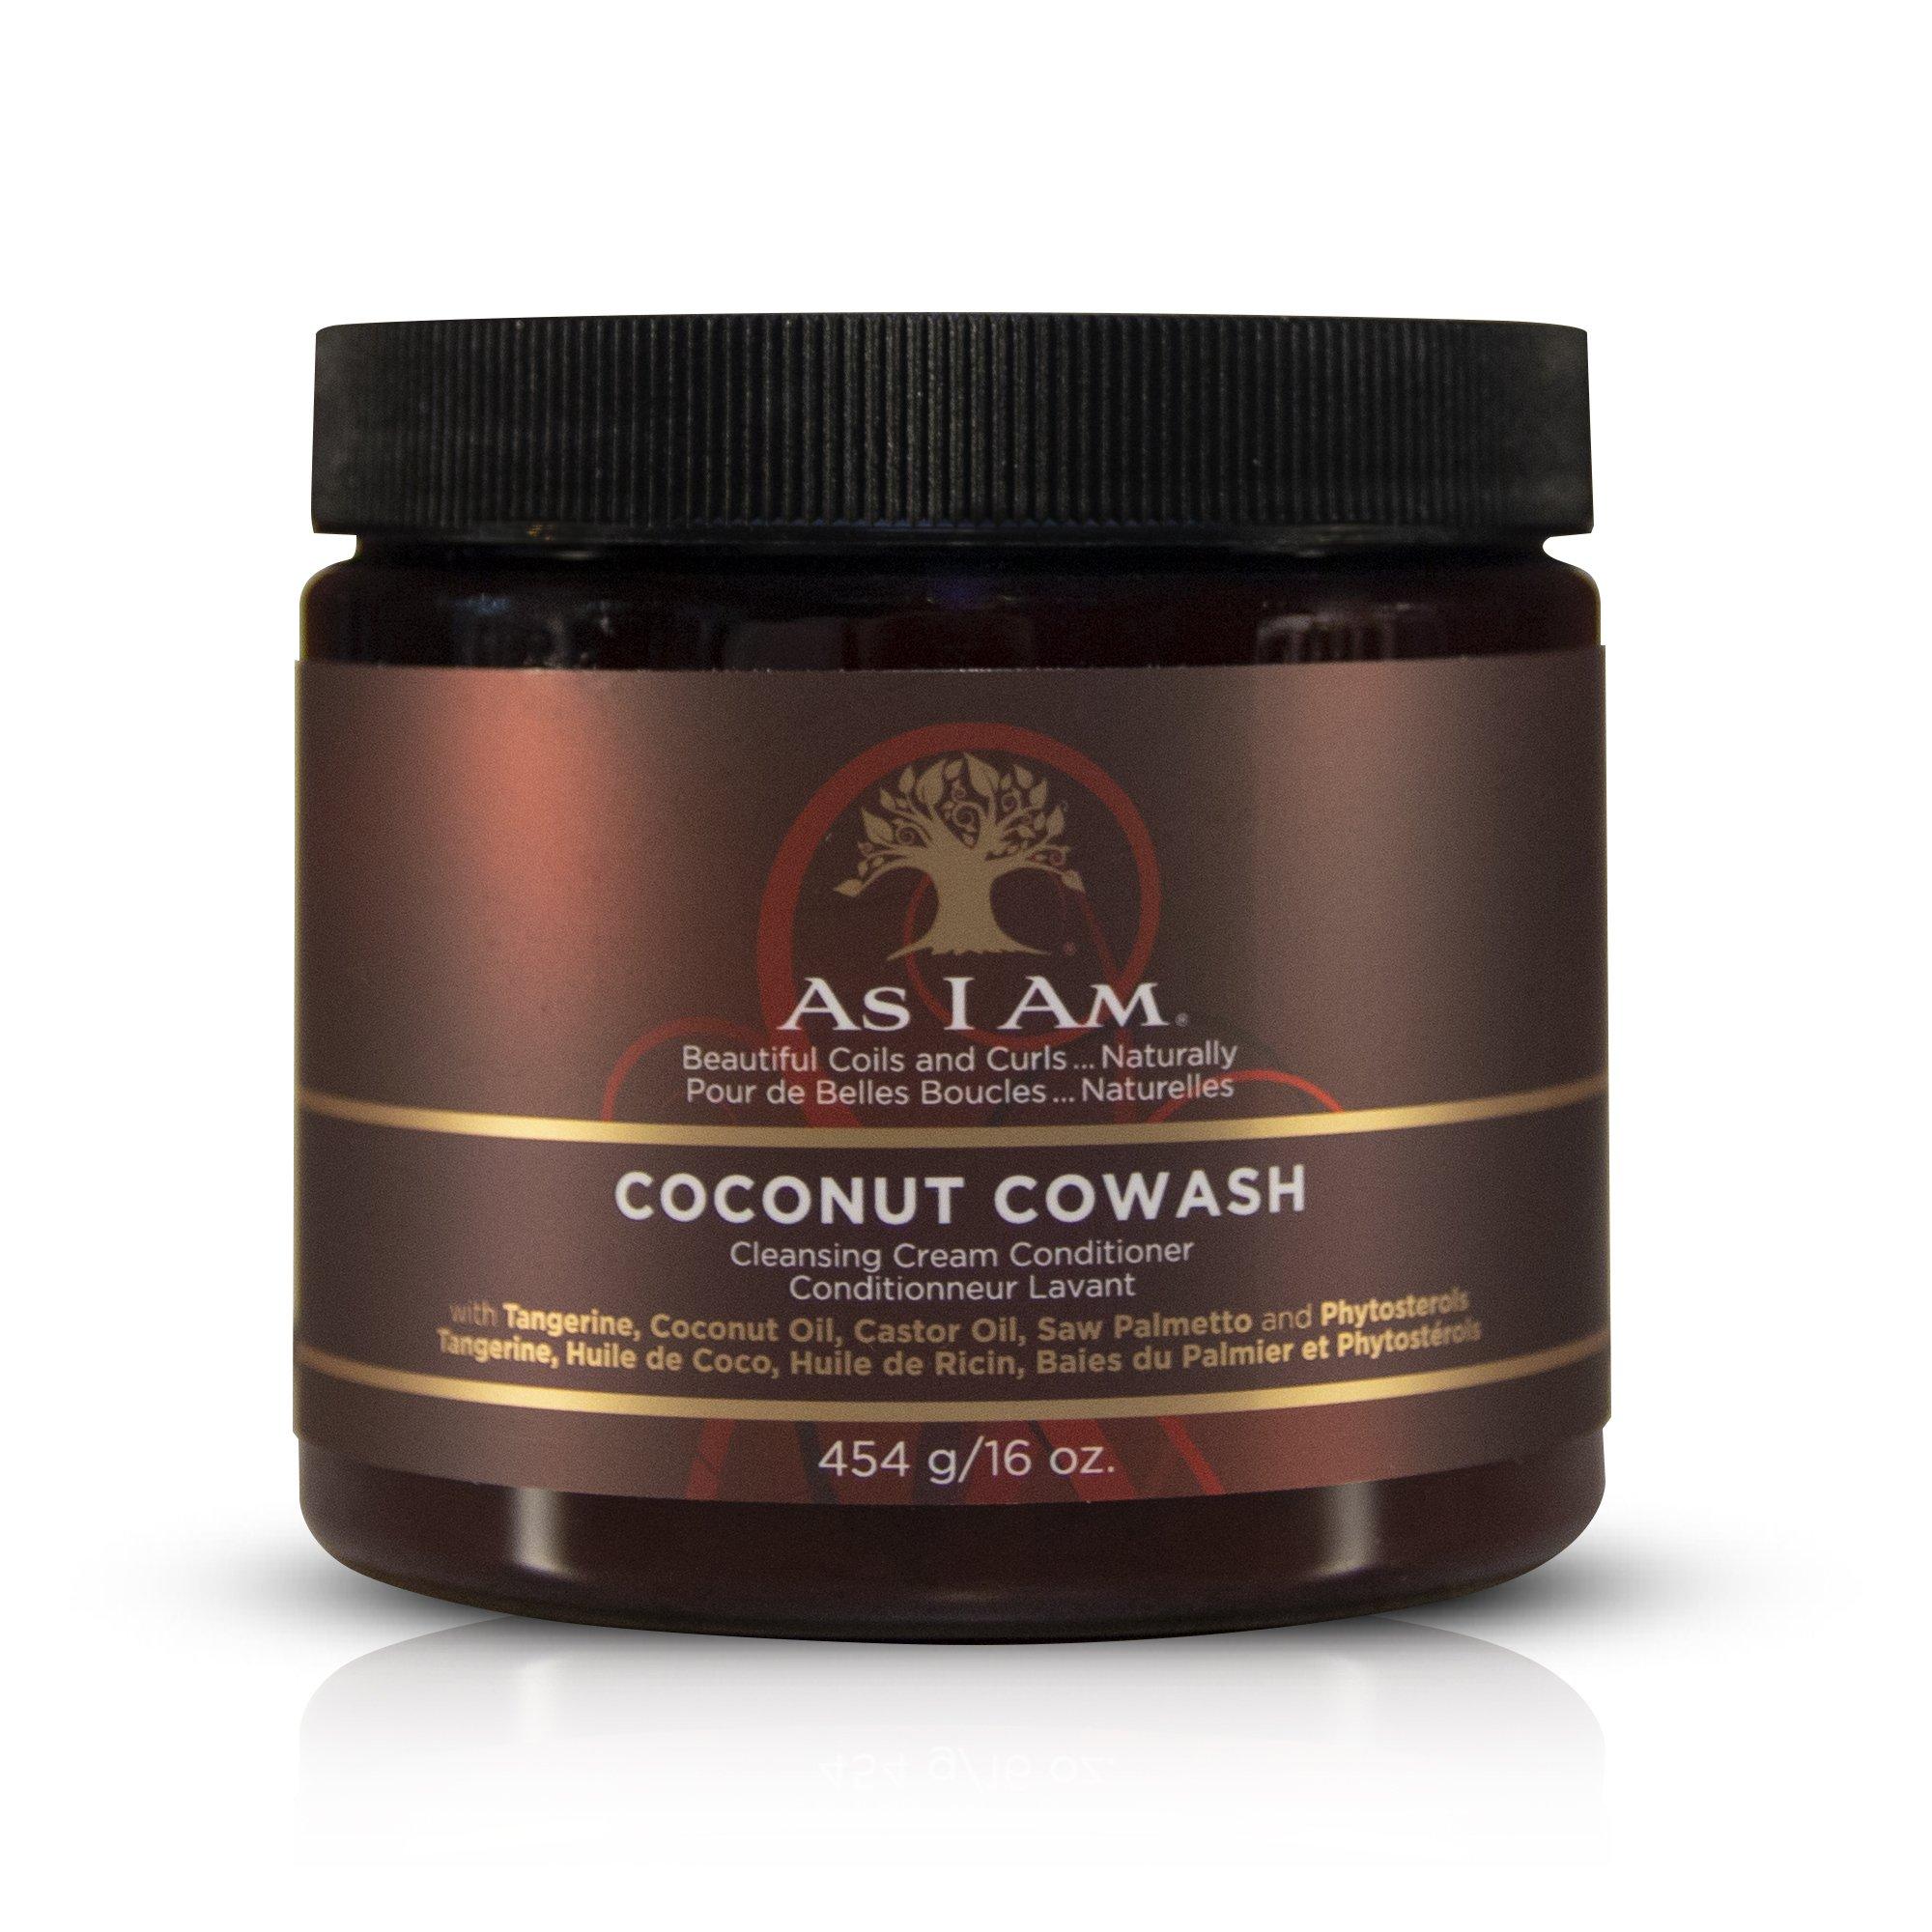 As i am Coconut Cowash 16oz